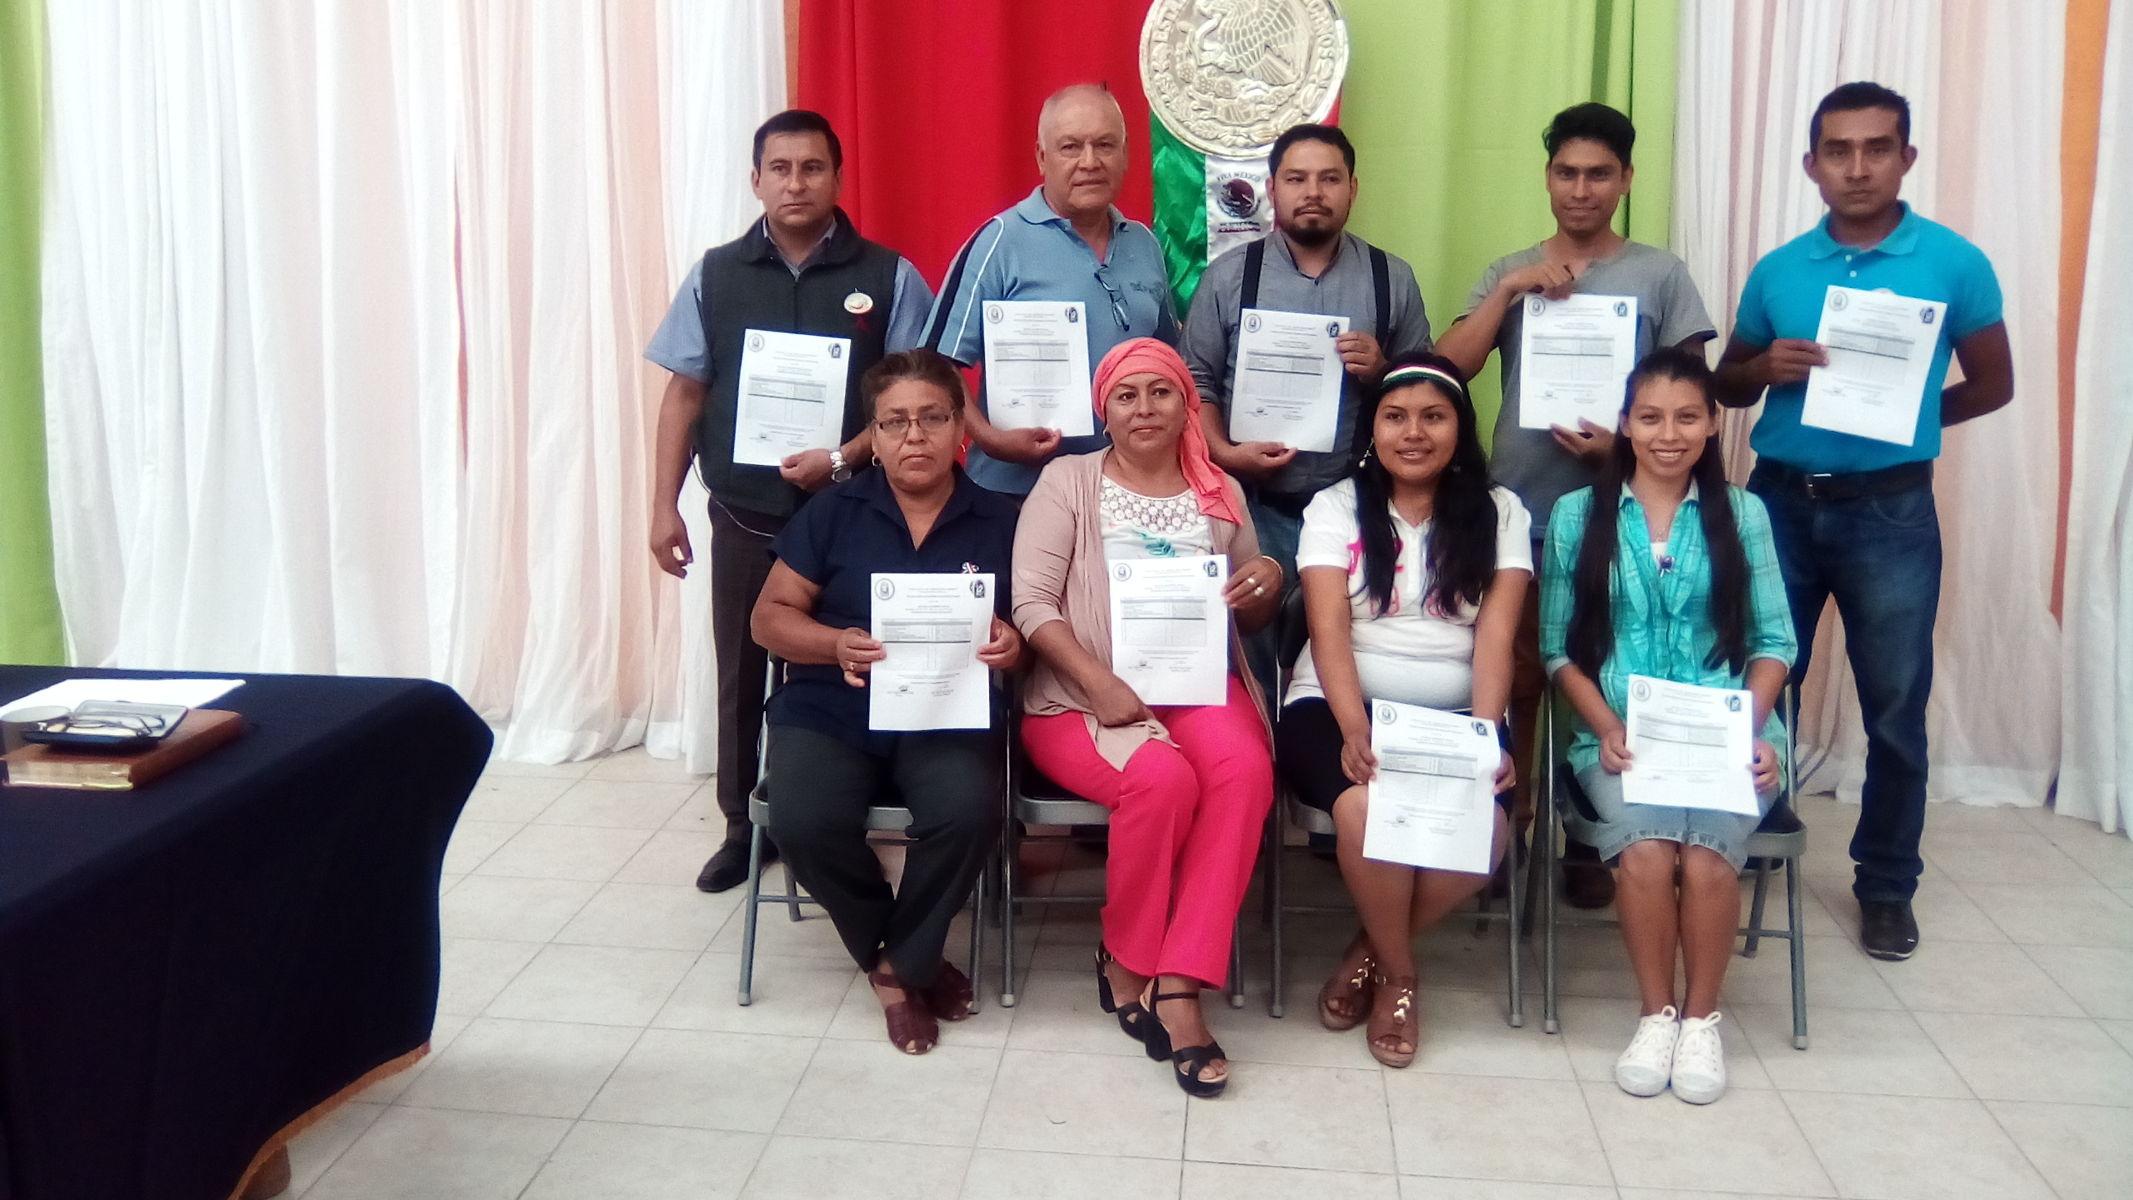 Diplomas SETE